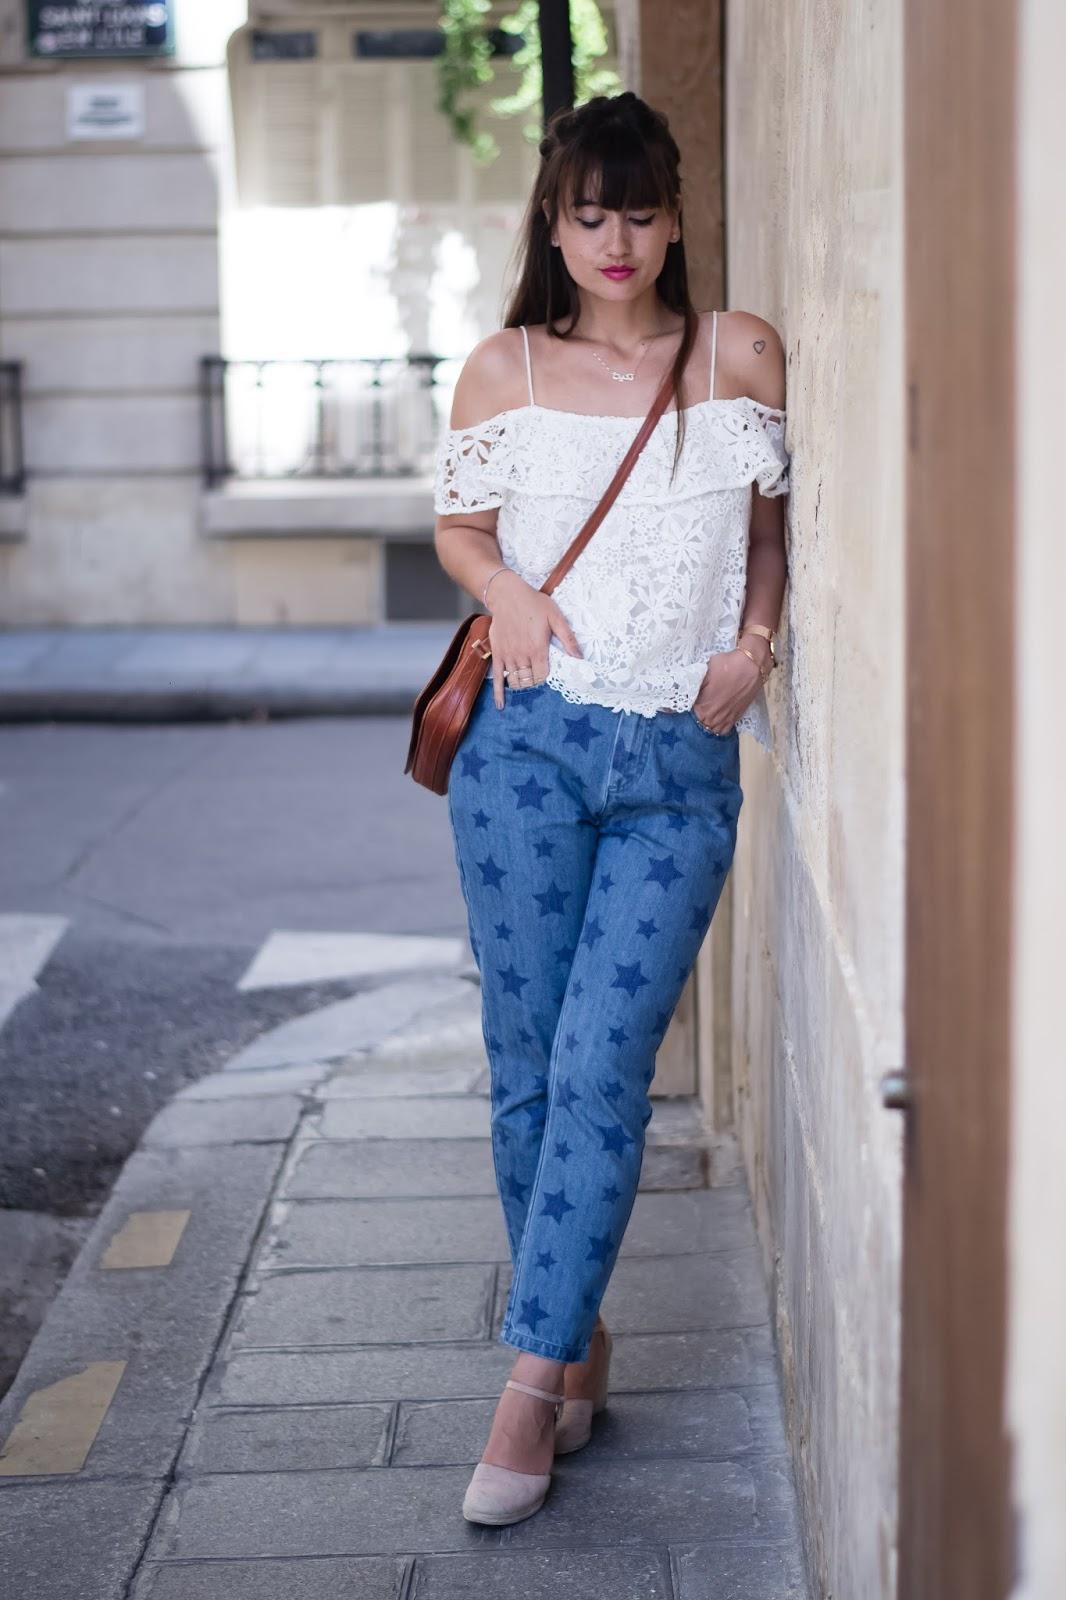 meetmeinparee, blogger, fashion, style,look, paris, mannish, street style, summer style